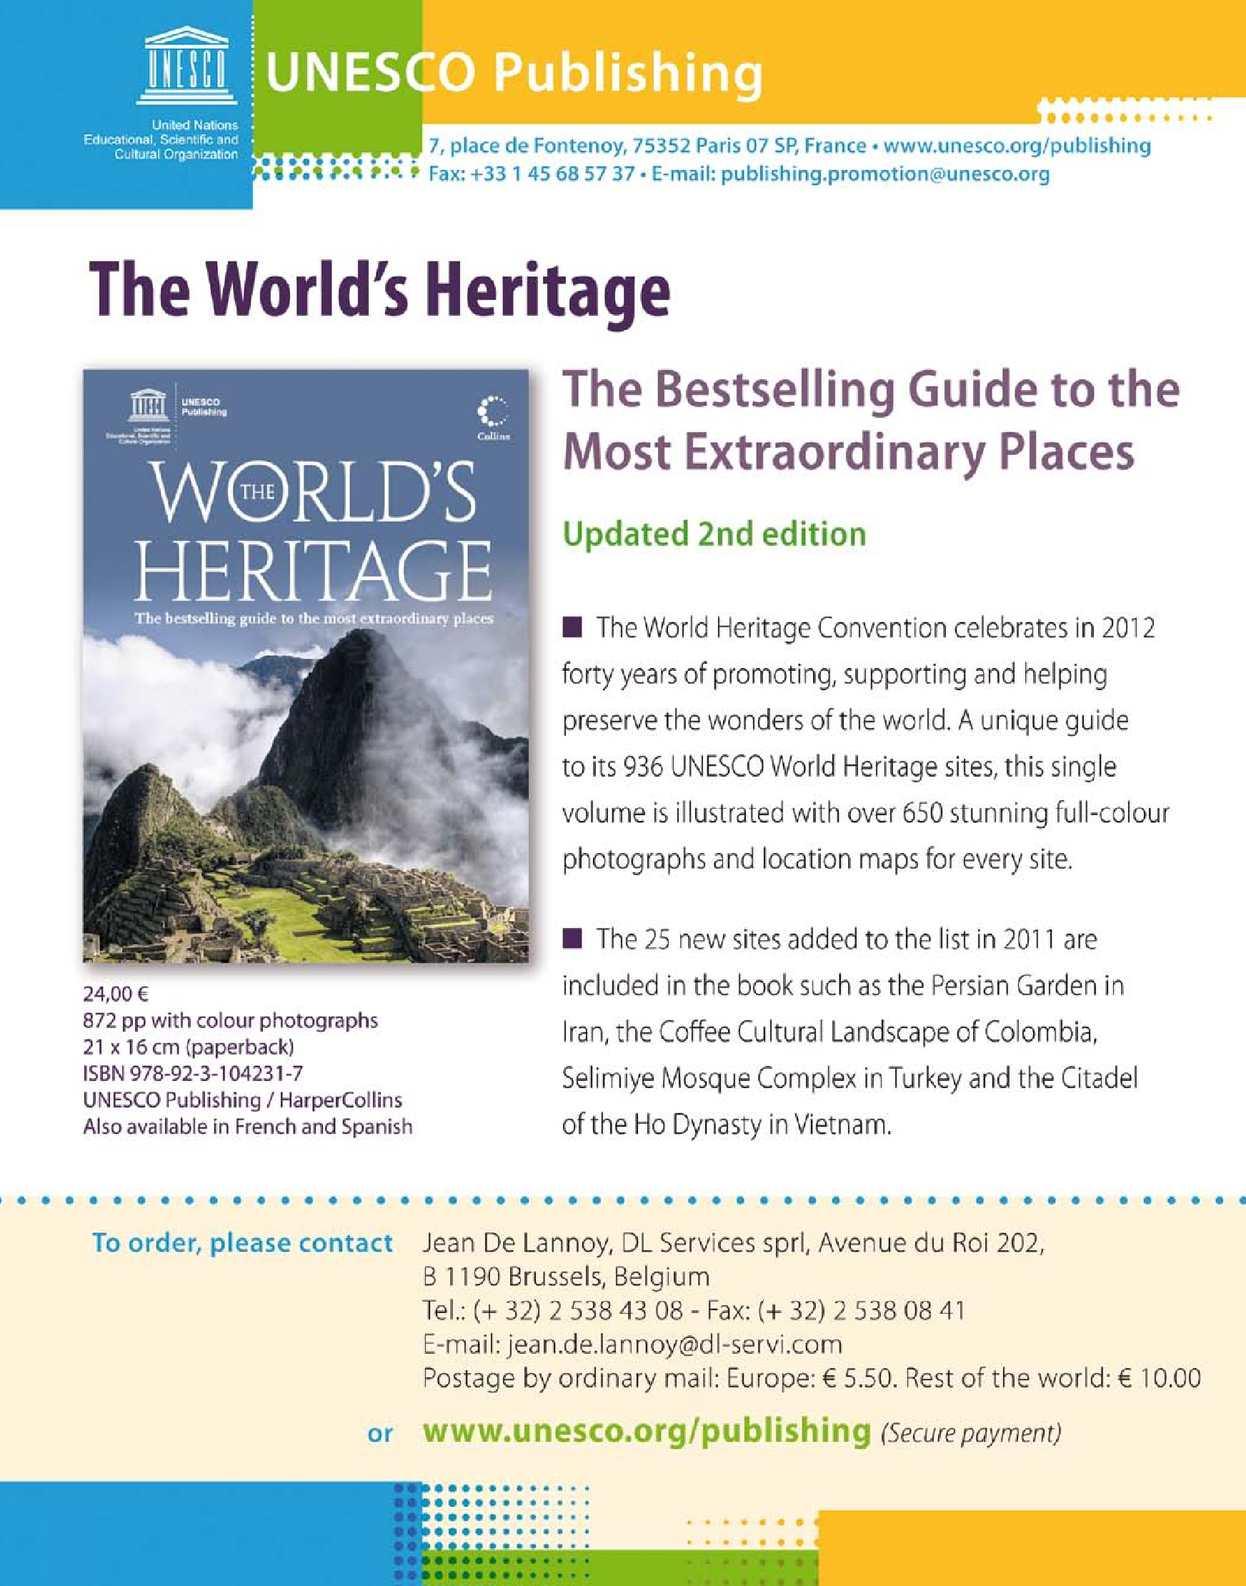 World Heritage 63 - CALAMEO Downloader